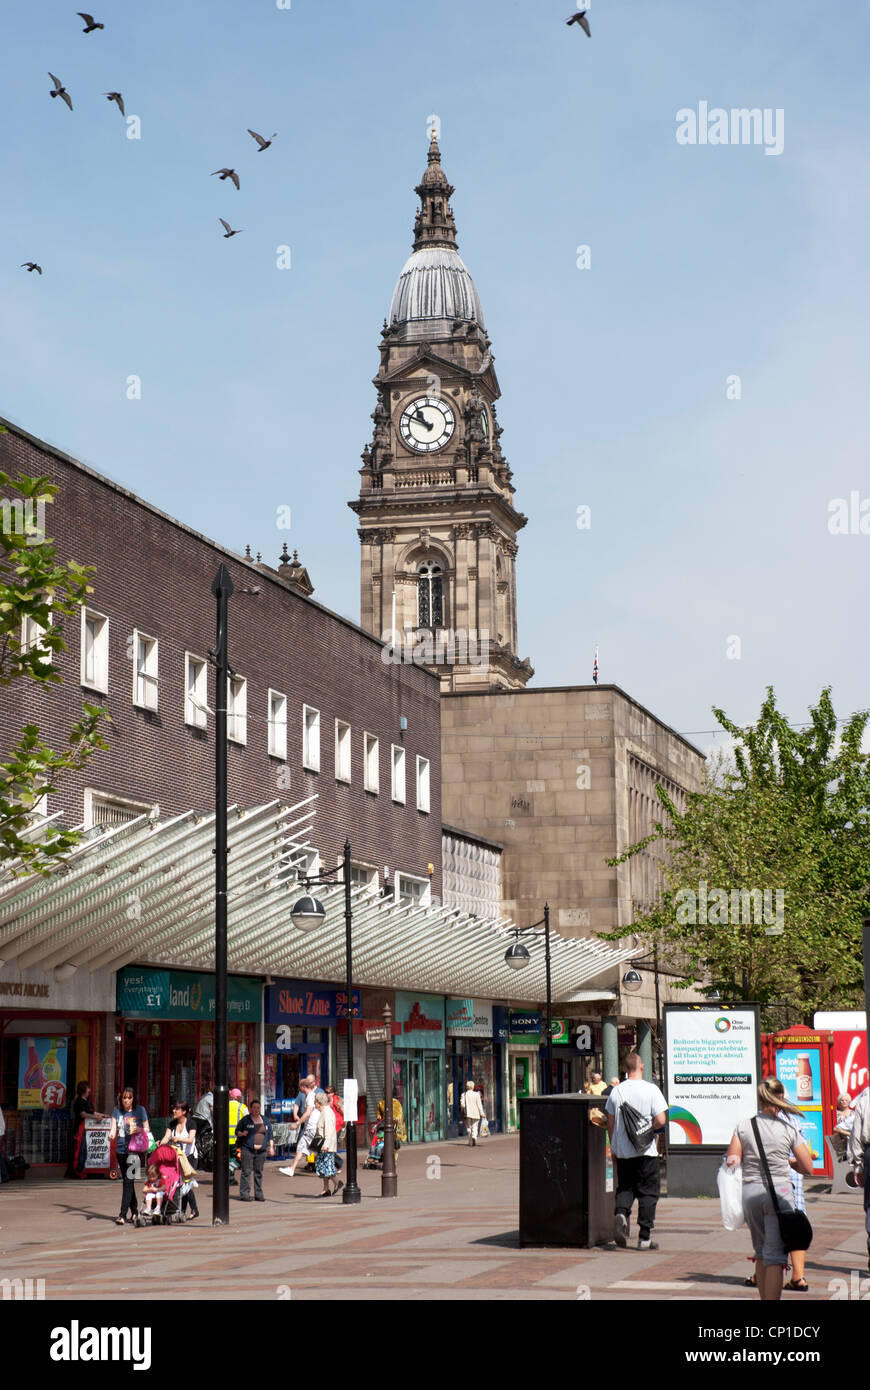 Bolton town centre - Stock Image